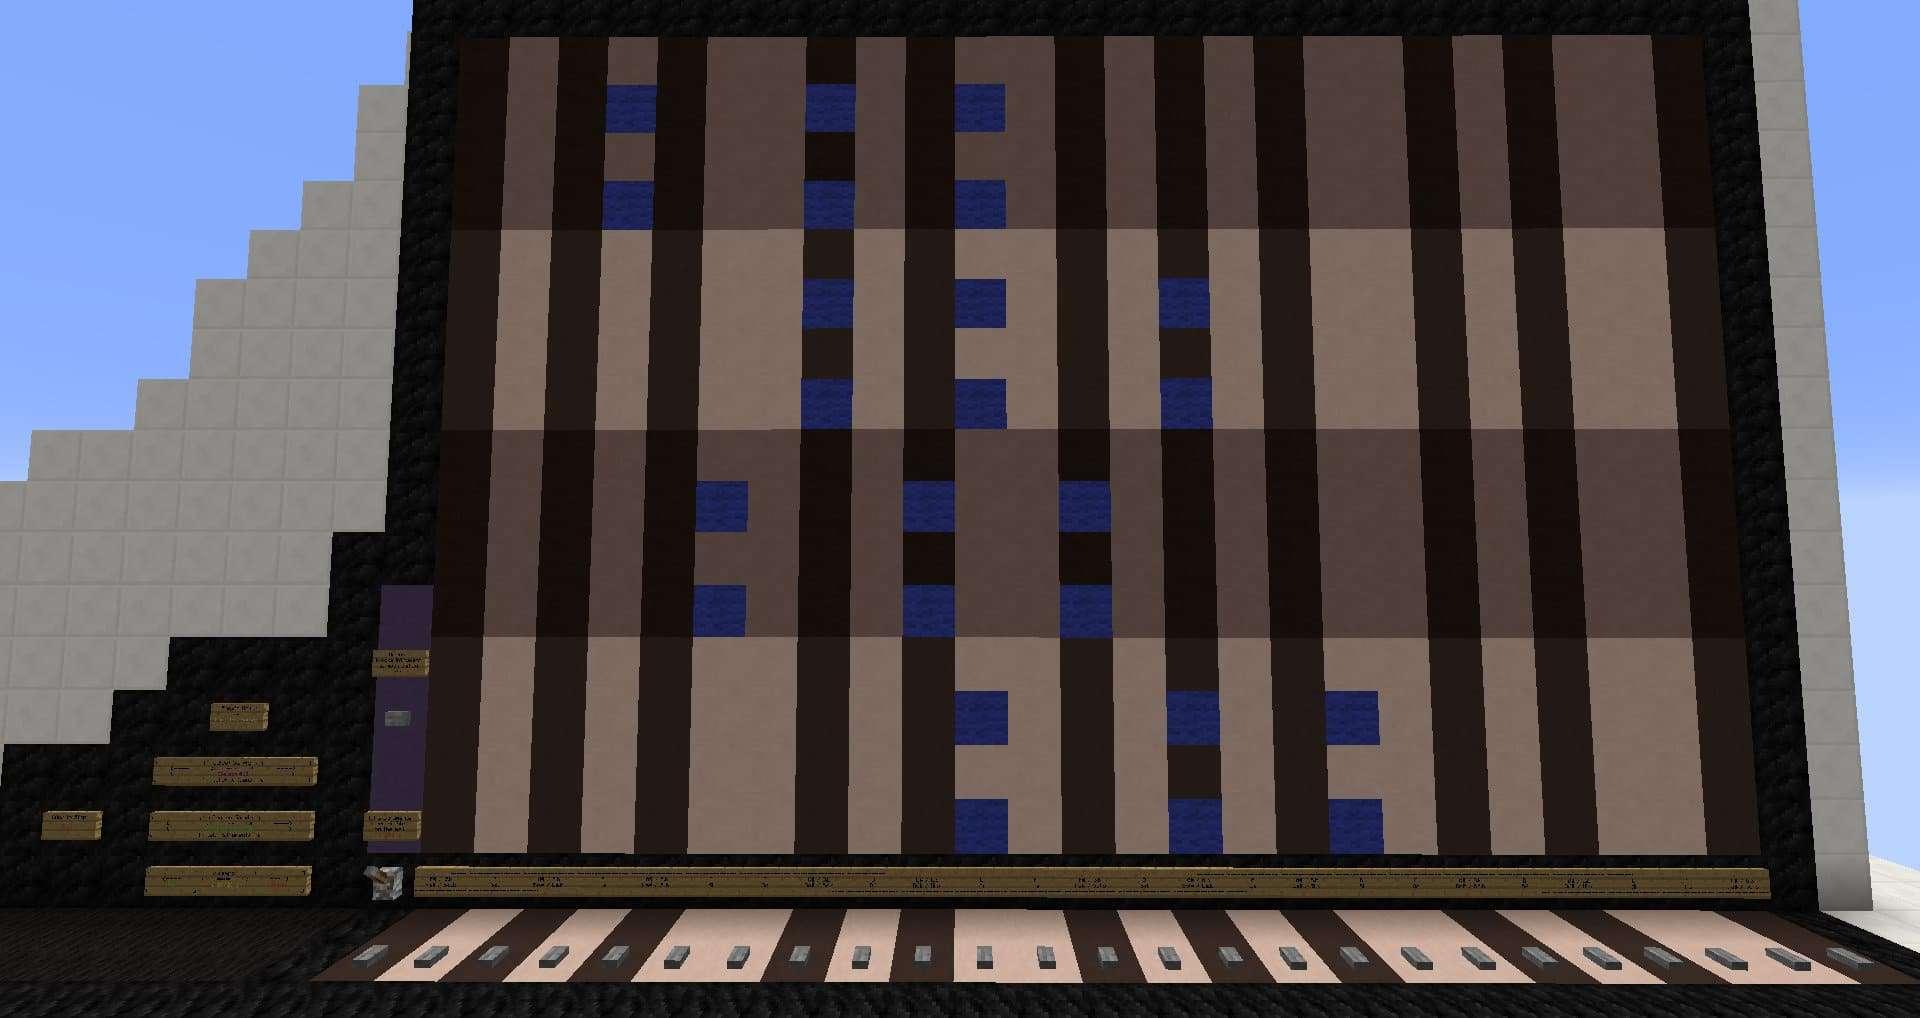 clone - séquenceur musical - piste